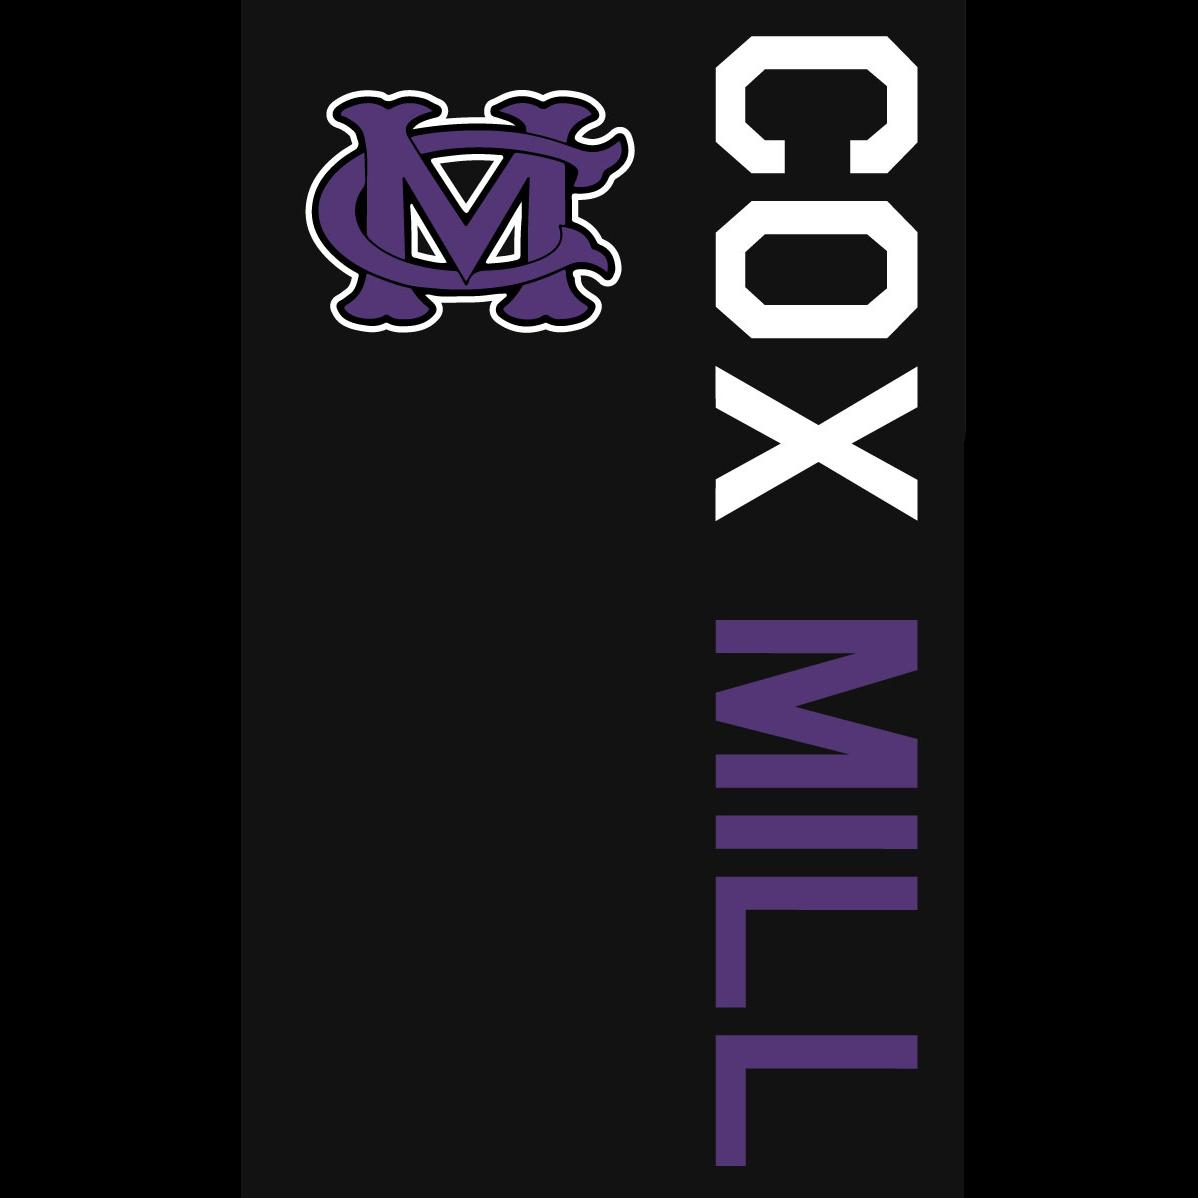 Cox-Mill-Powerhouse_clipped_rev_2